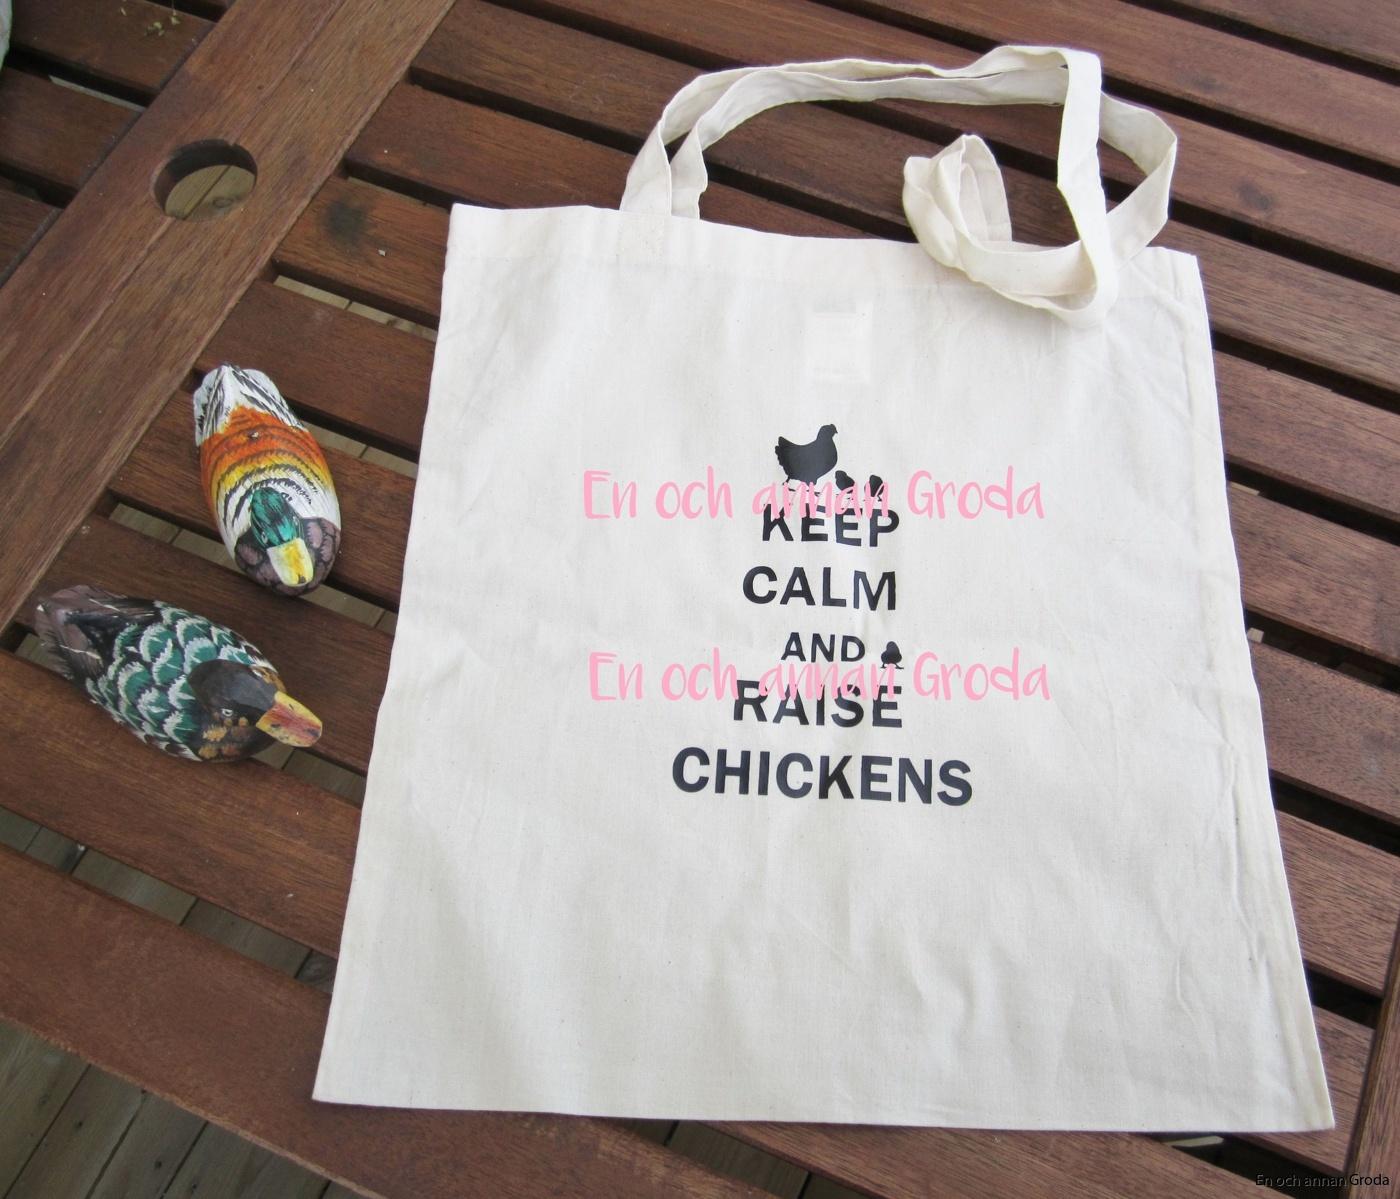 kasse keep calm chickens #1